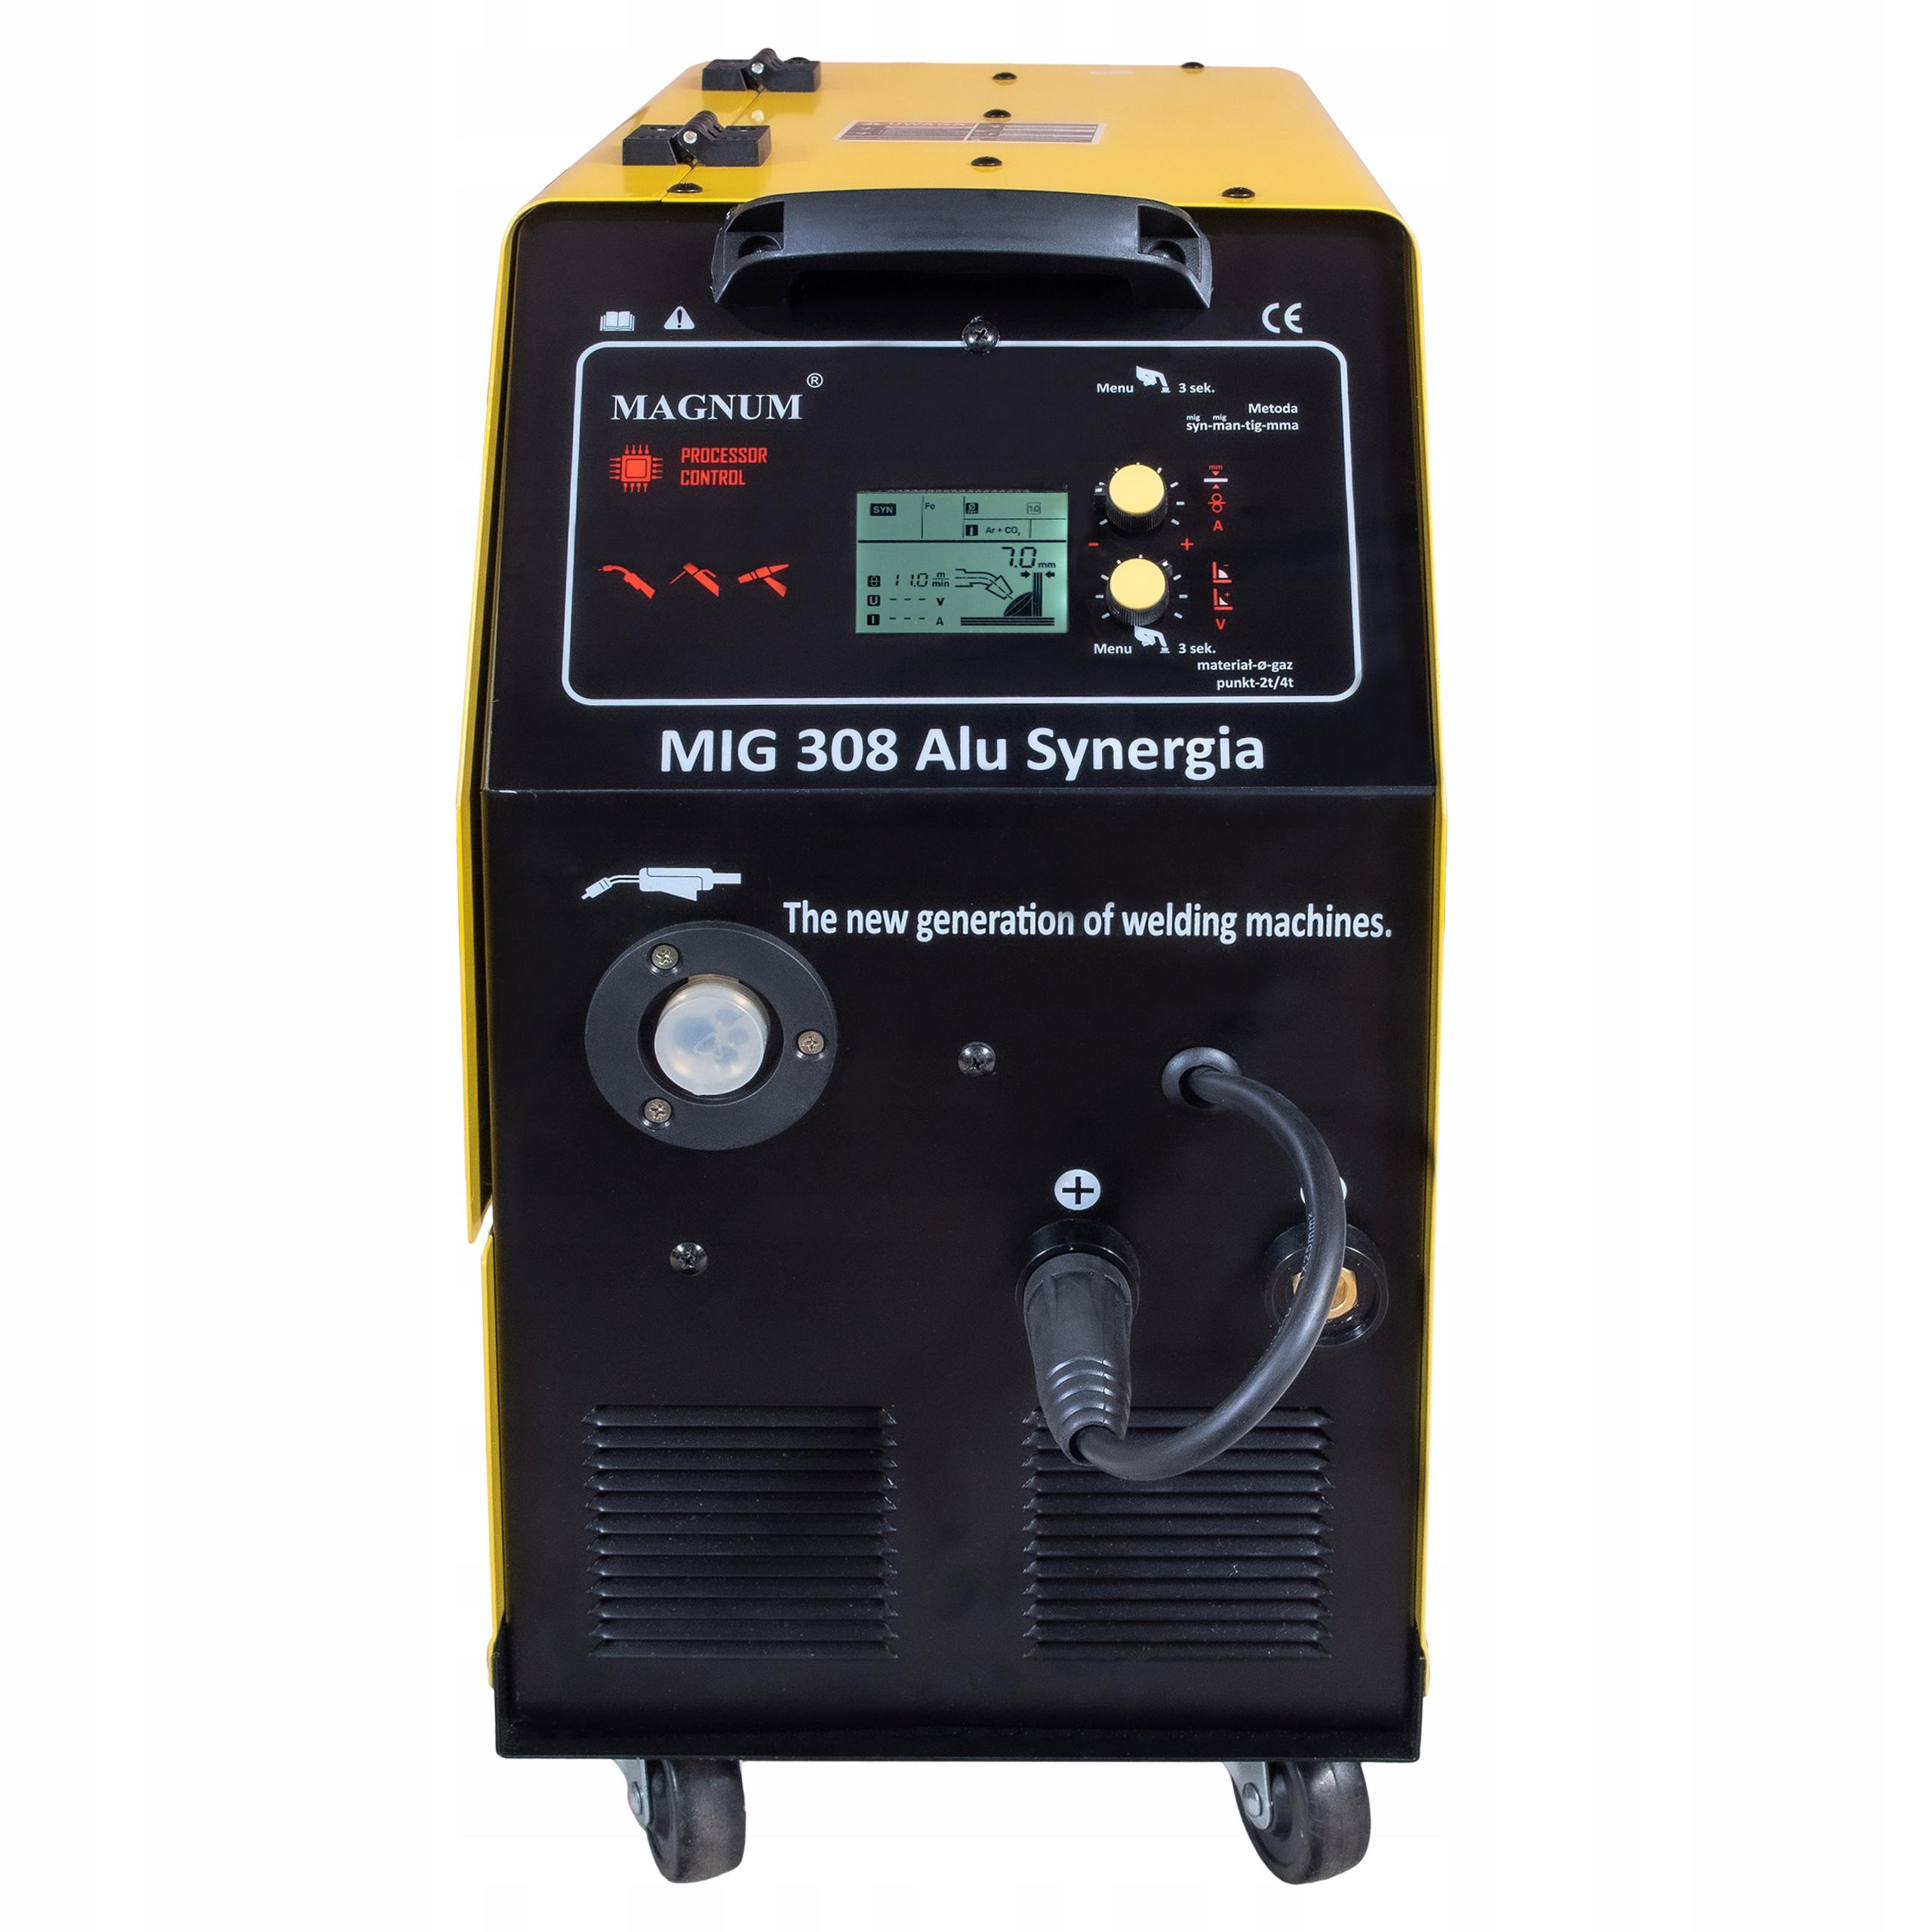 SPAWARKA MIGOMAT MAGNUM MIG 308 ALU SYNERGIA 400V Metody spawania MIG/MAG MMA TIG